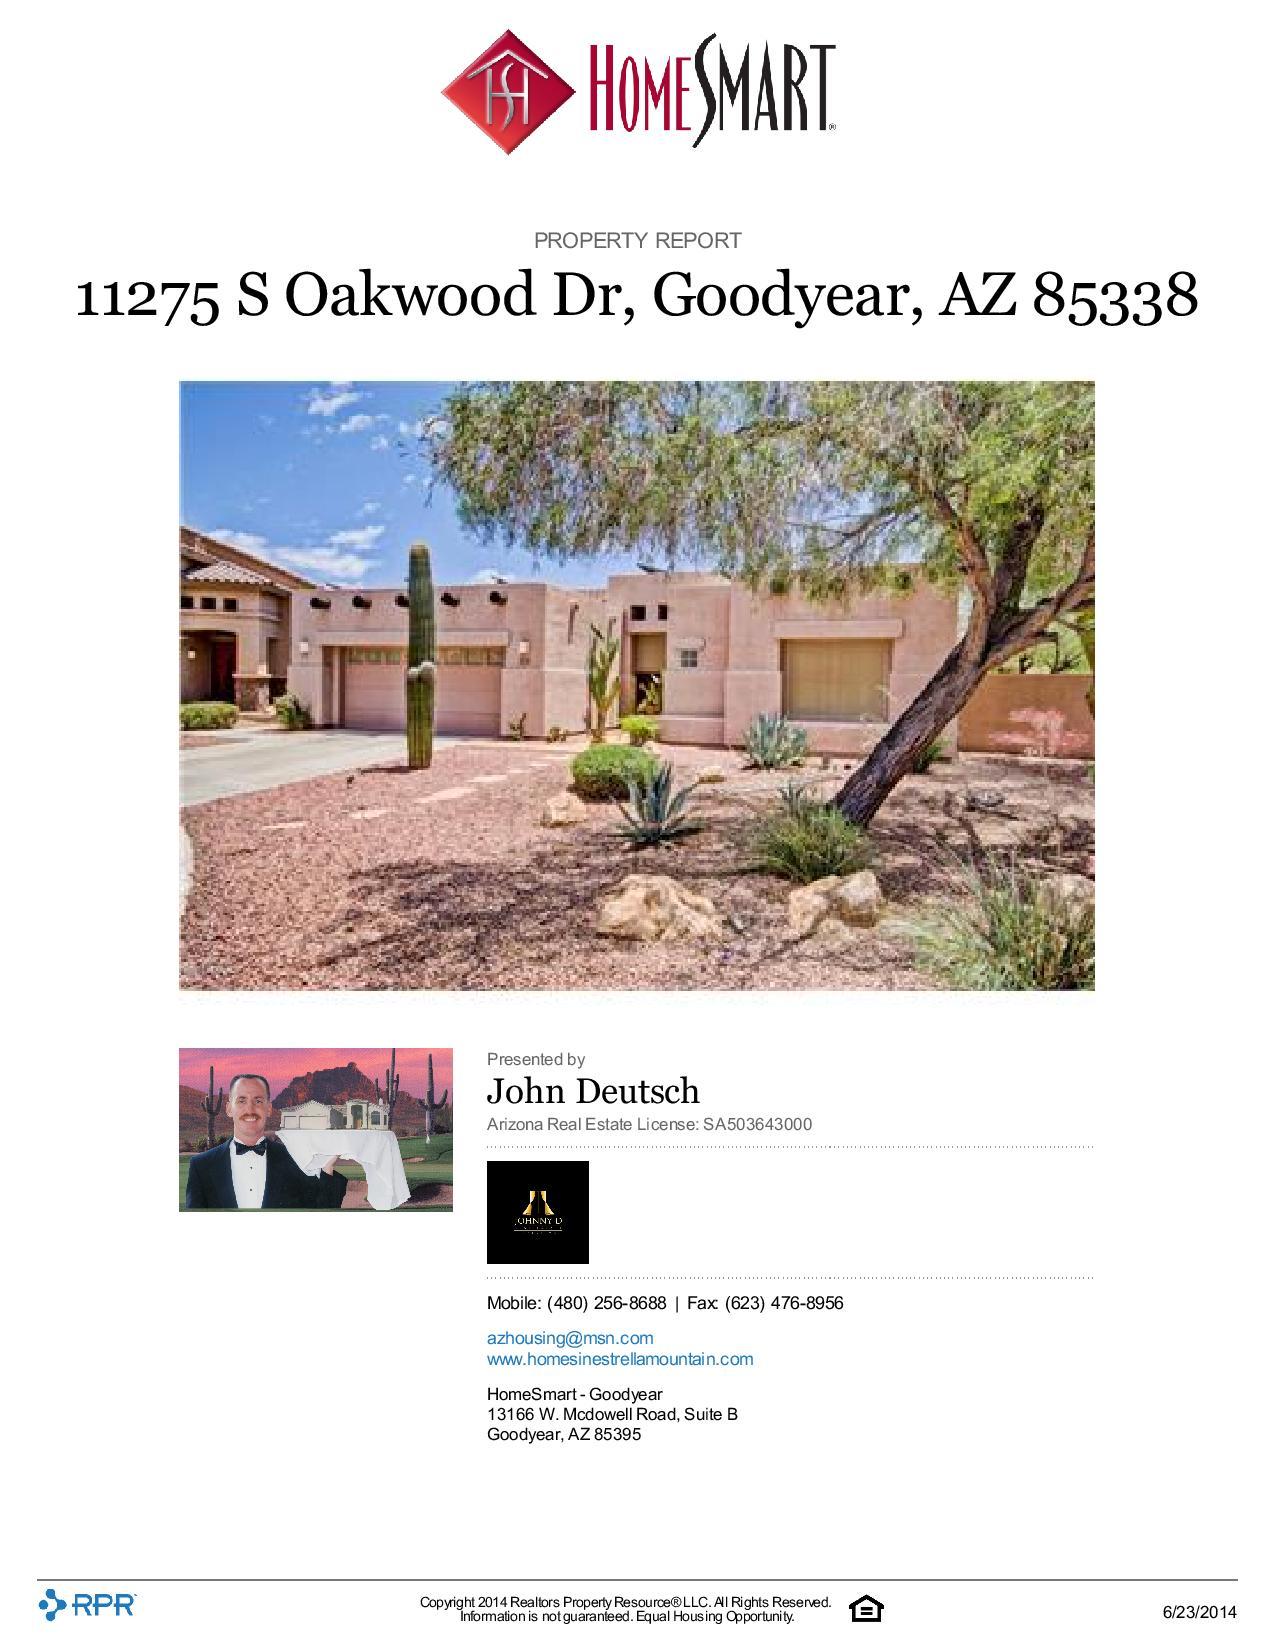 11275-S-Oakwood-Dr-Goodyear-AZ-85338-page-001